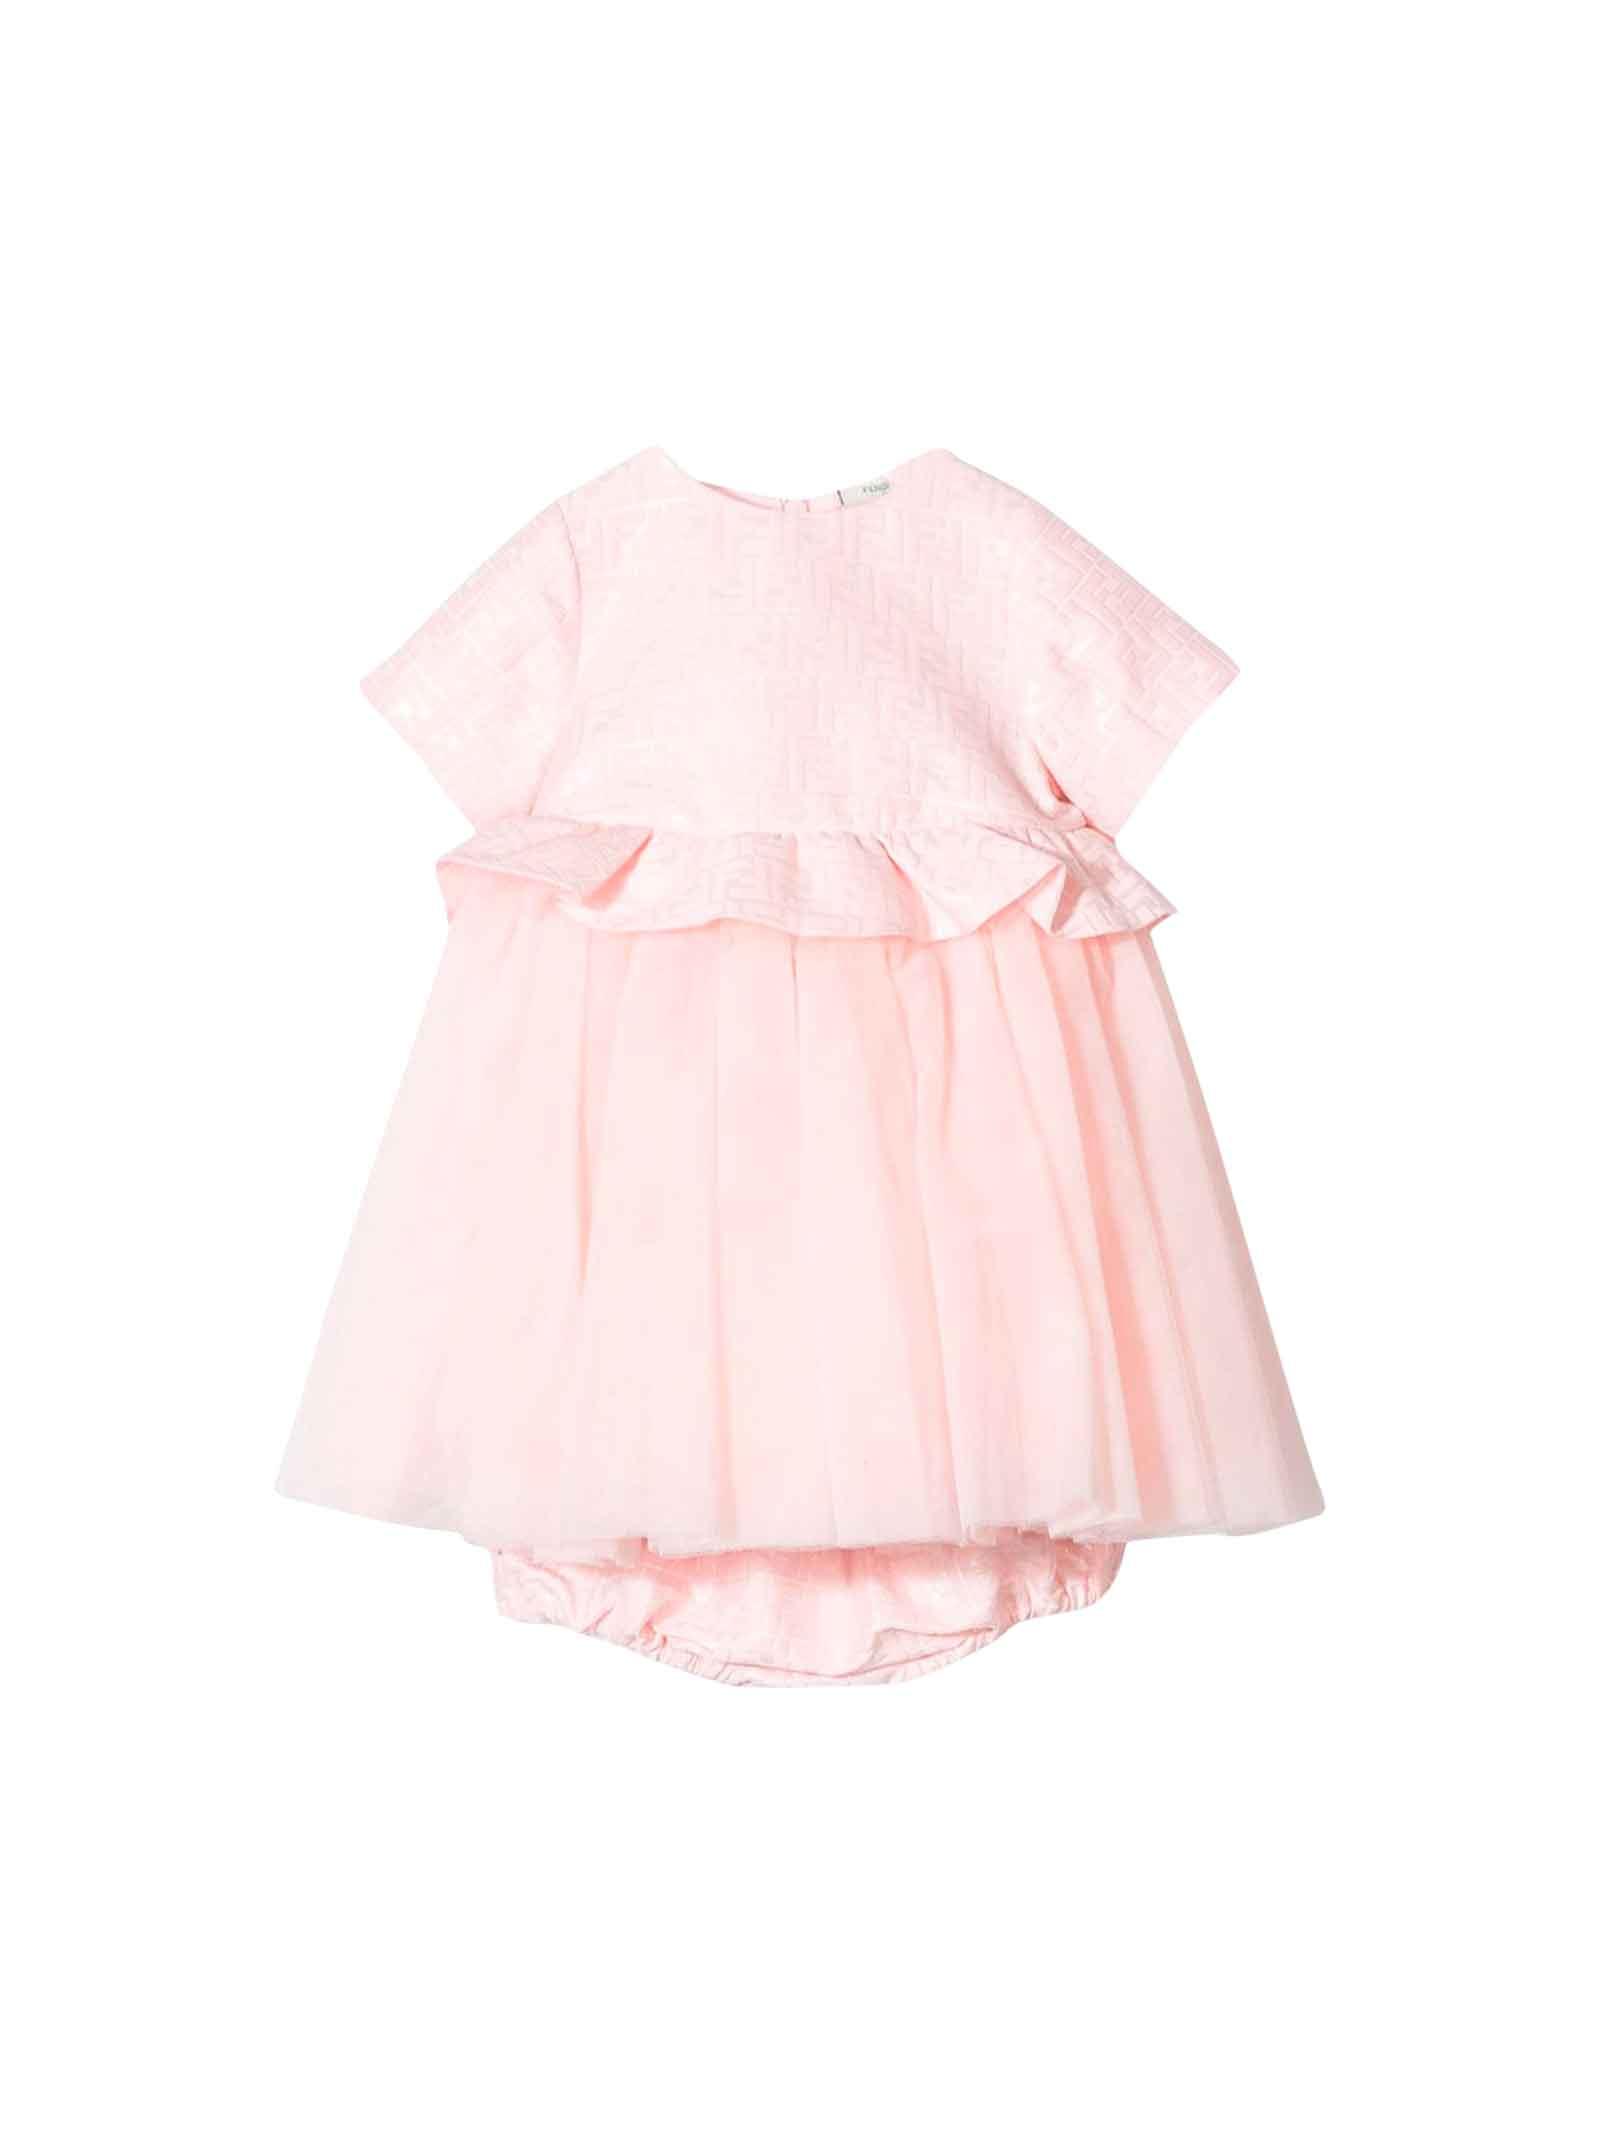 Fendi Baby Pink Dress